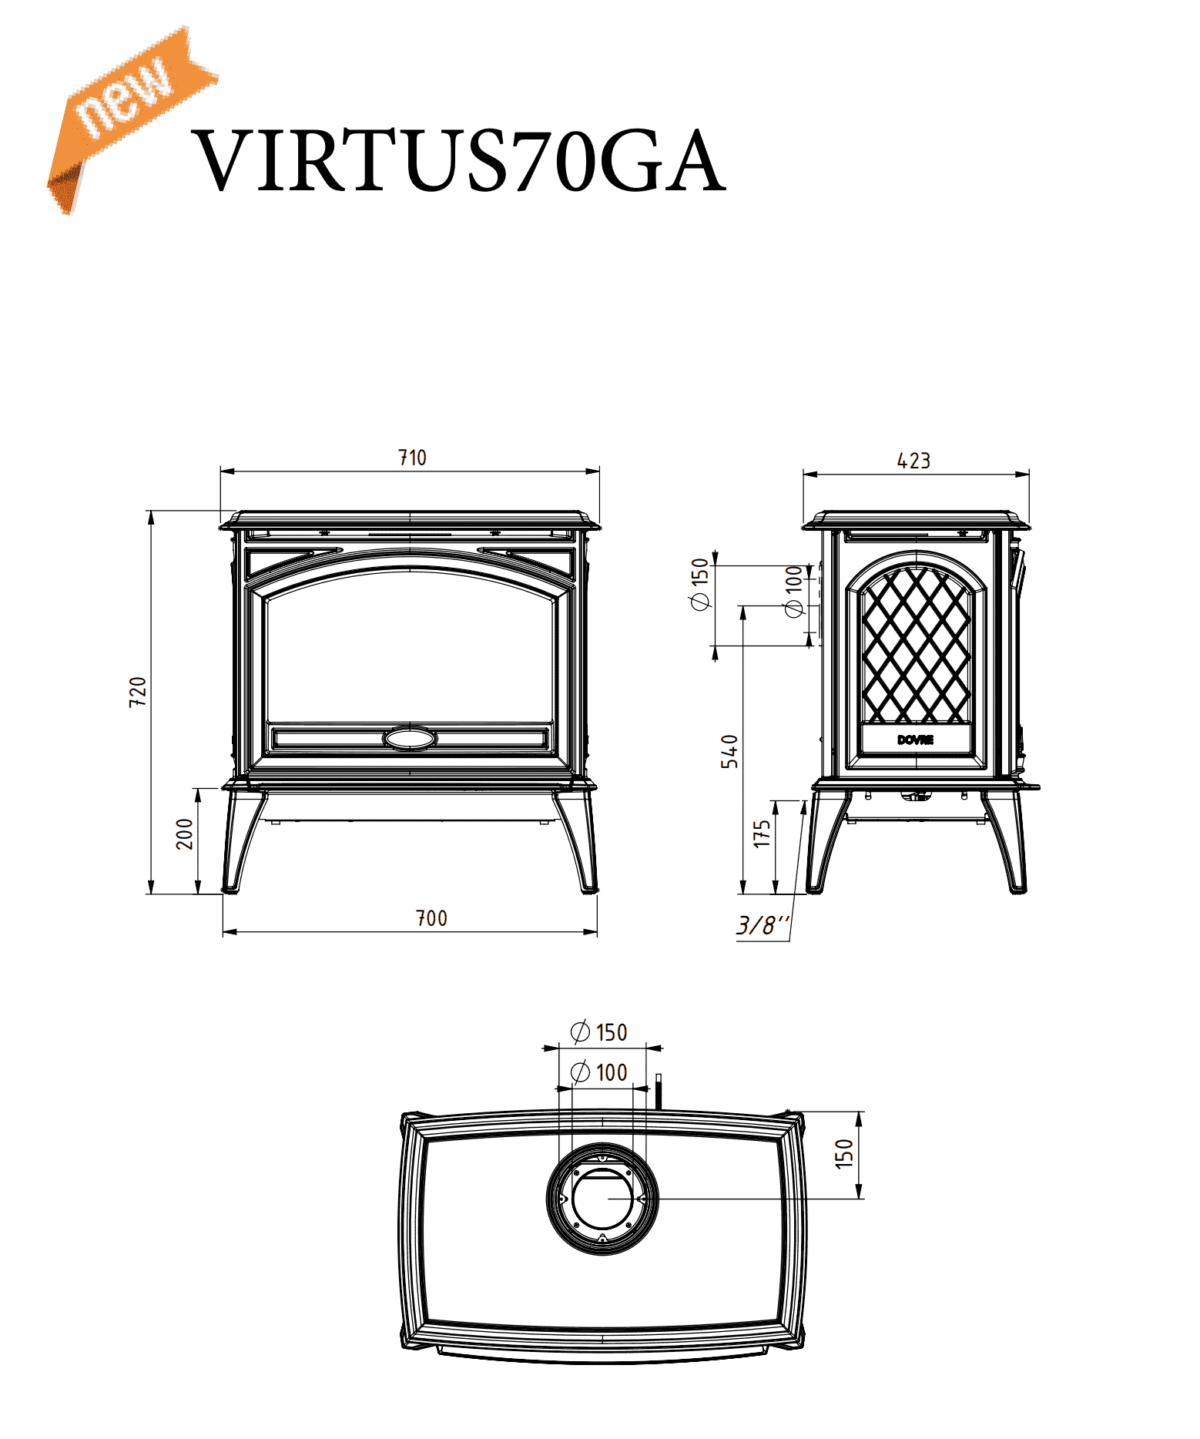 dovre-virtus-70-gas-gesloten-line_image